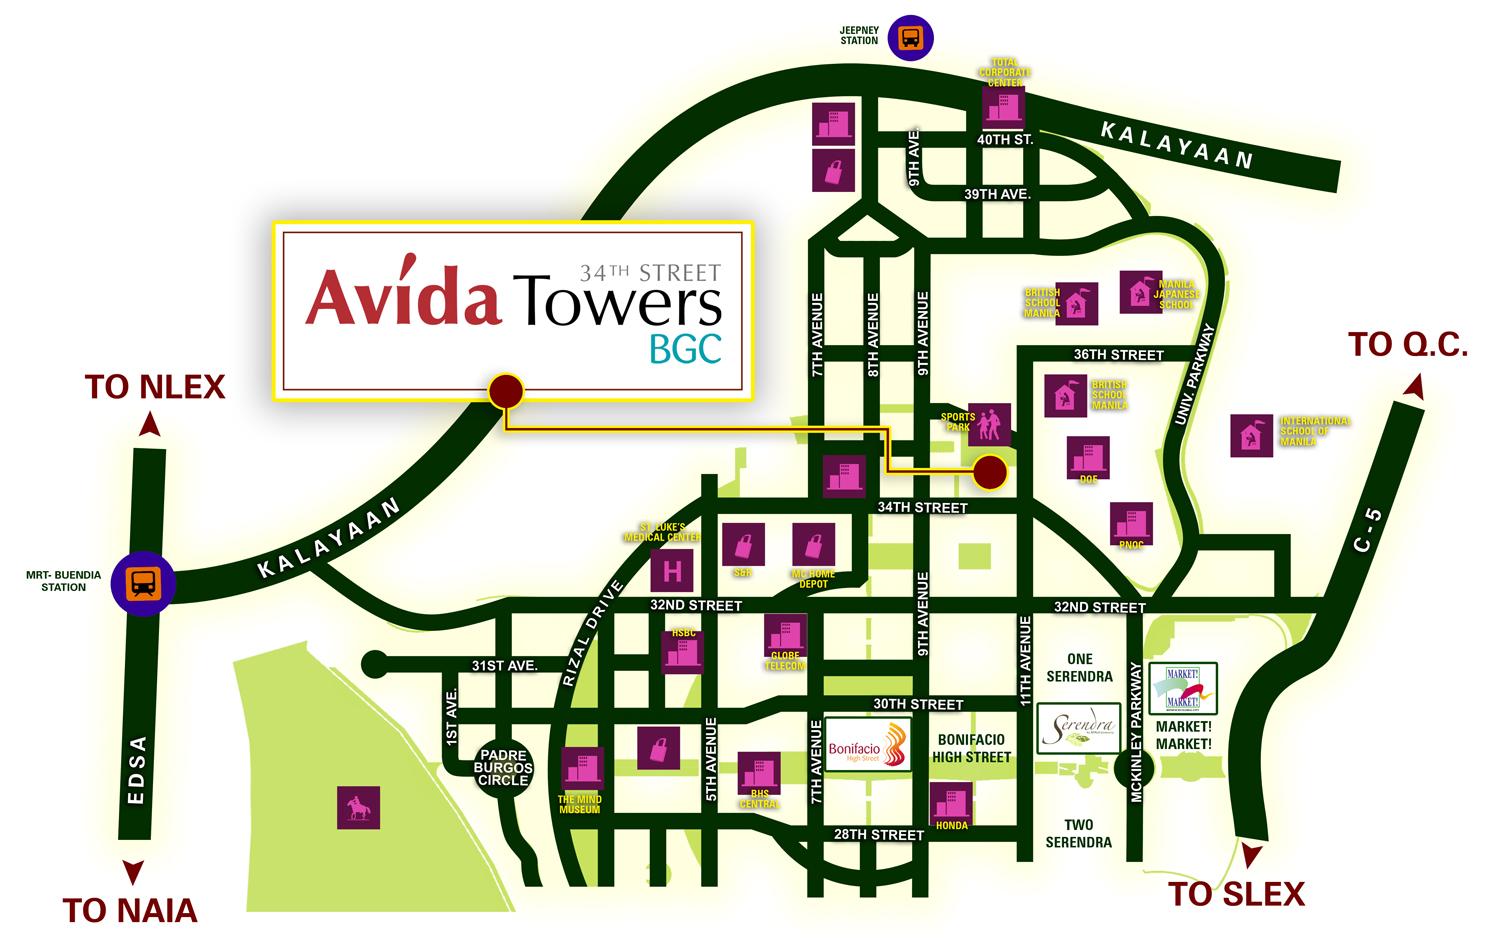 Avida Towers Bgc 34th Street Condo In The Fort Avida Towers Condo In The Philippines